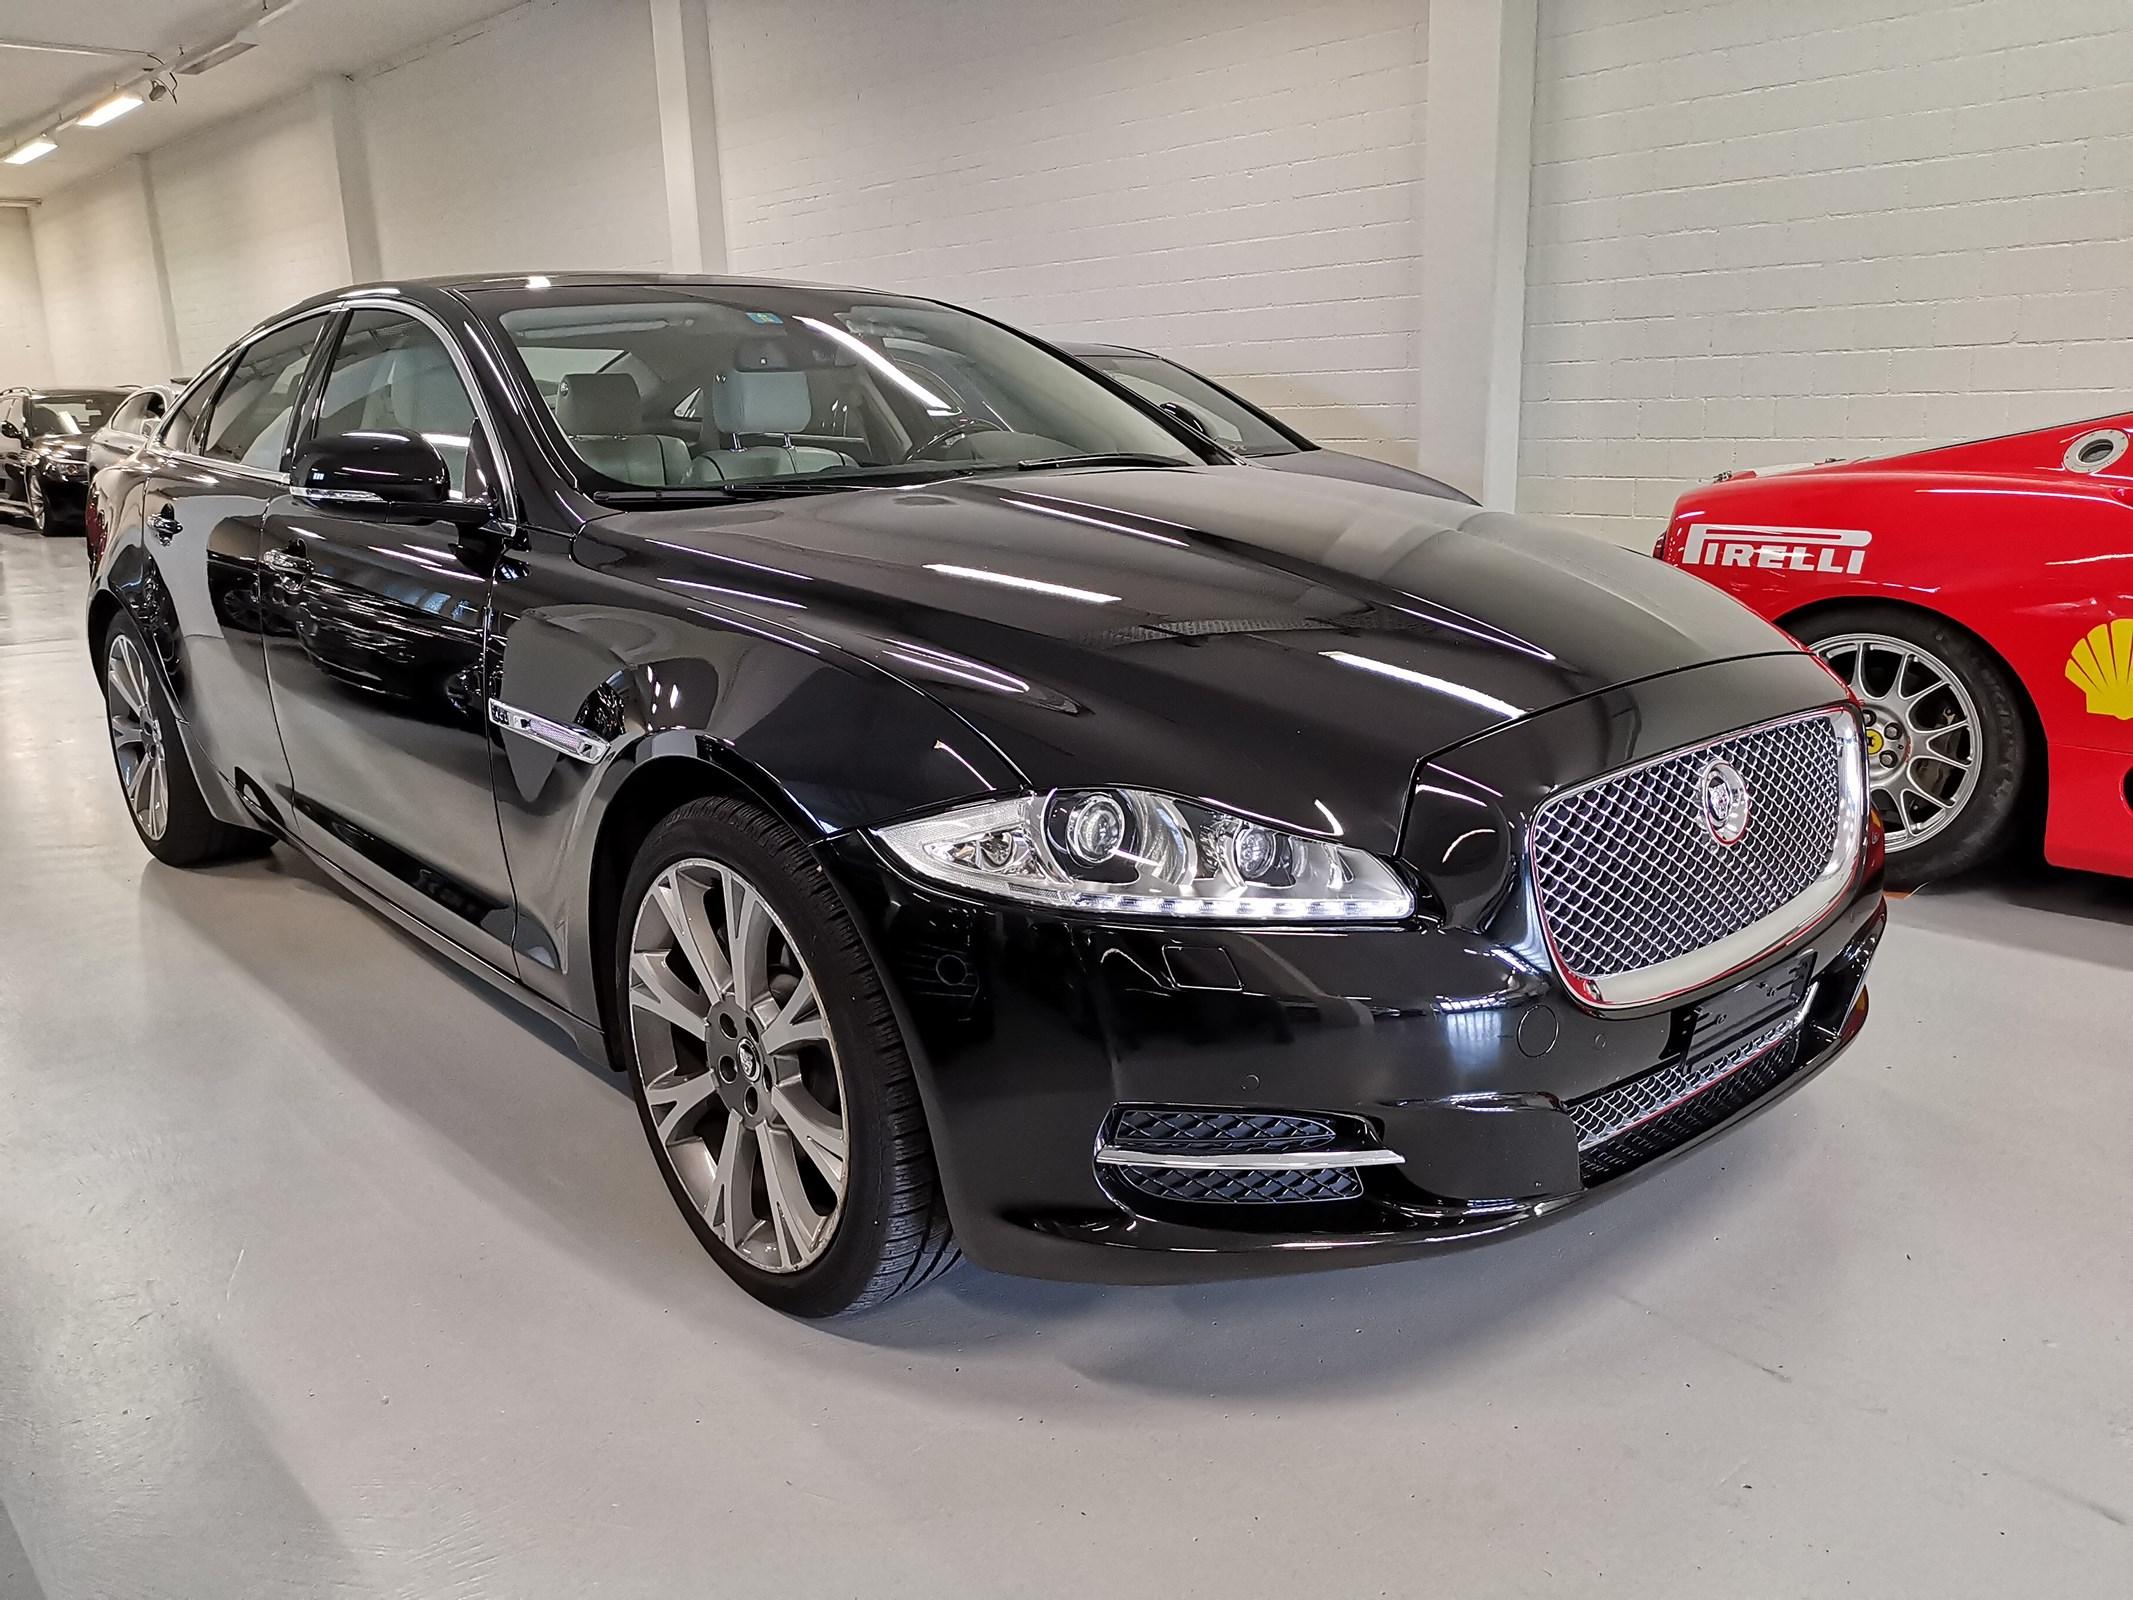 saloon Jaguar XJ 3.0 V6 S/C Portfolio Automatic AWD